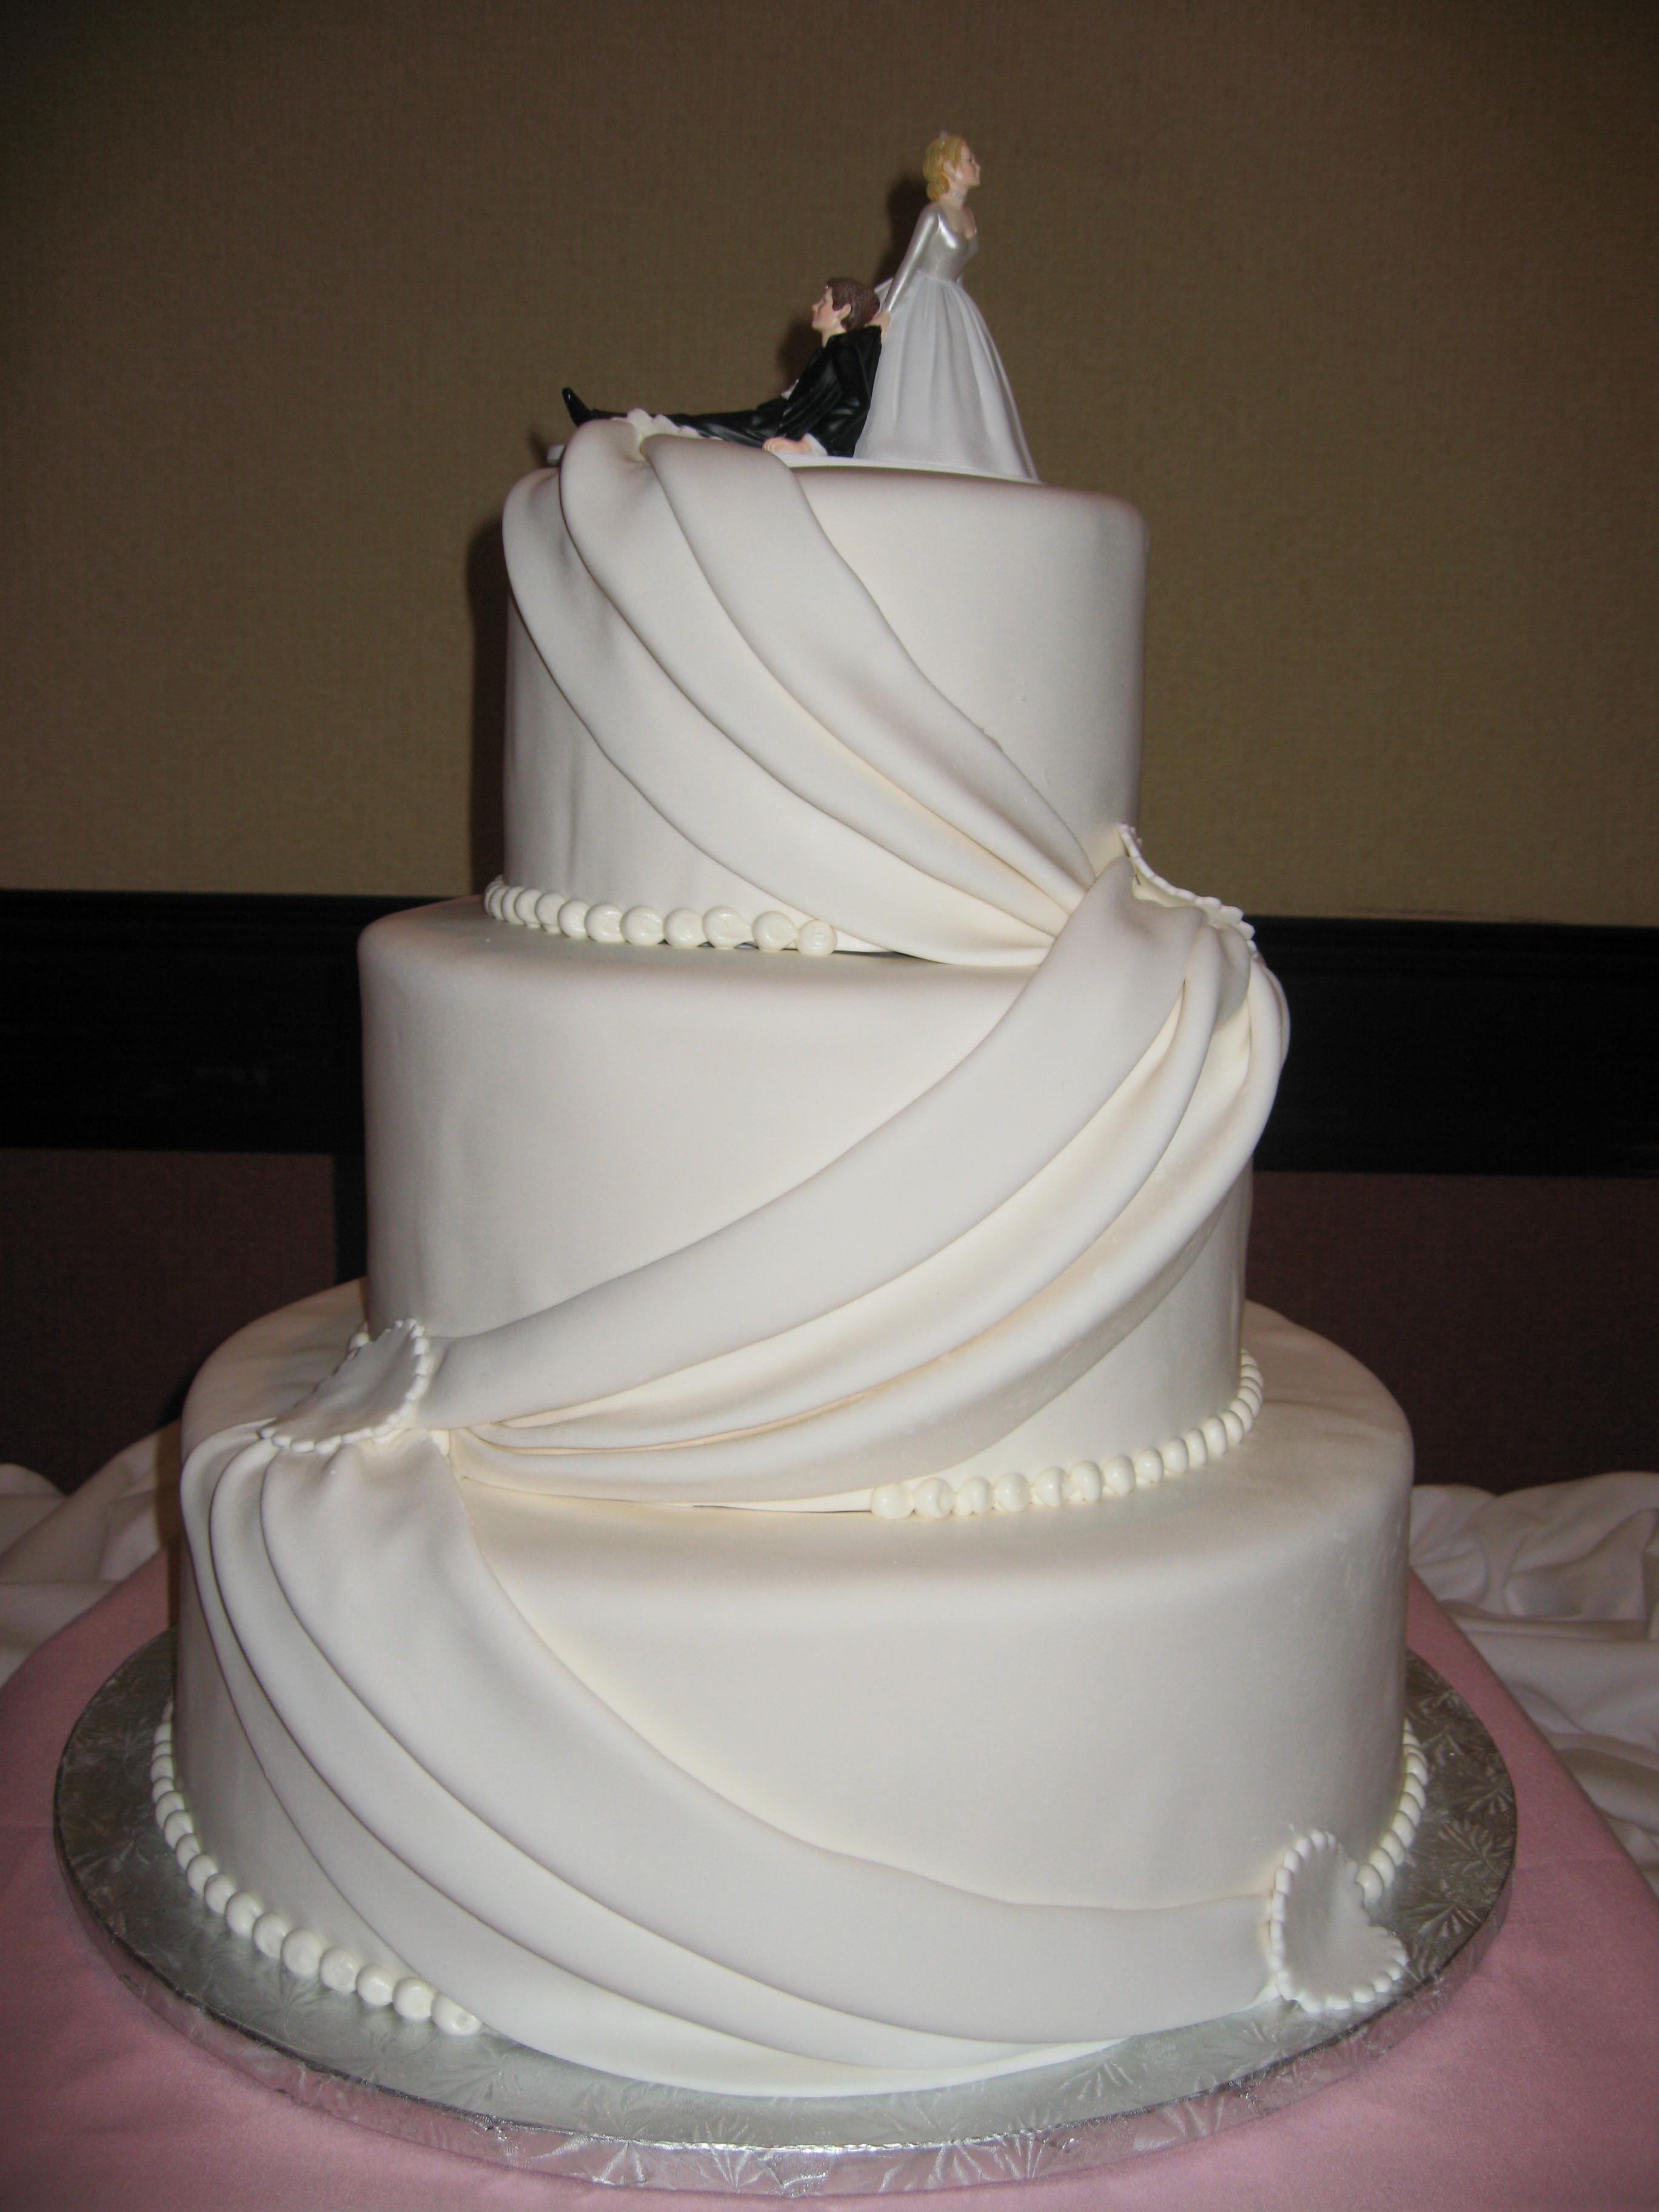 Wedding Cakes Ornaments  Wedding Cake Decorations Wedding Design Ideas